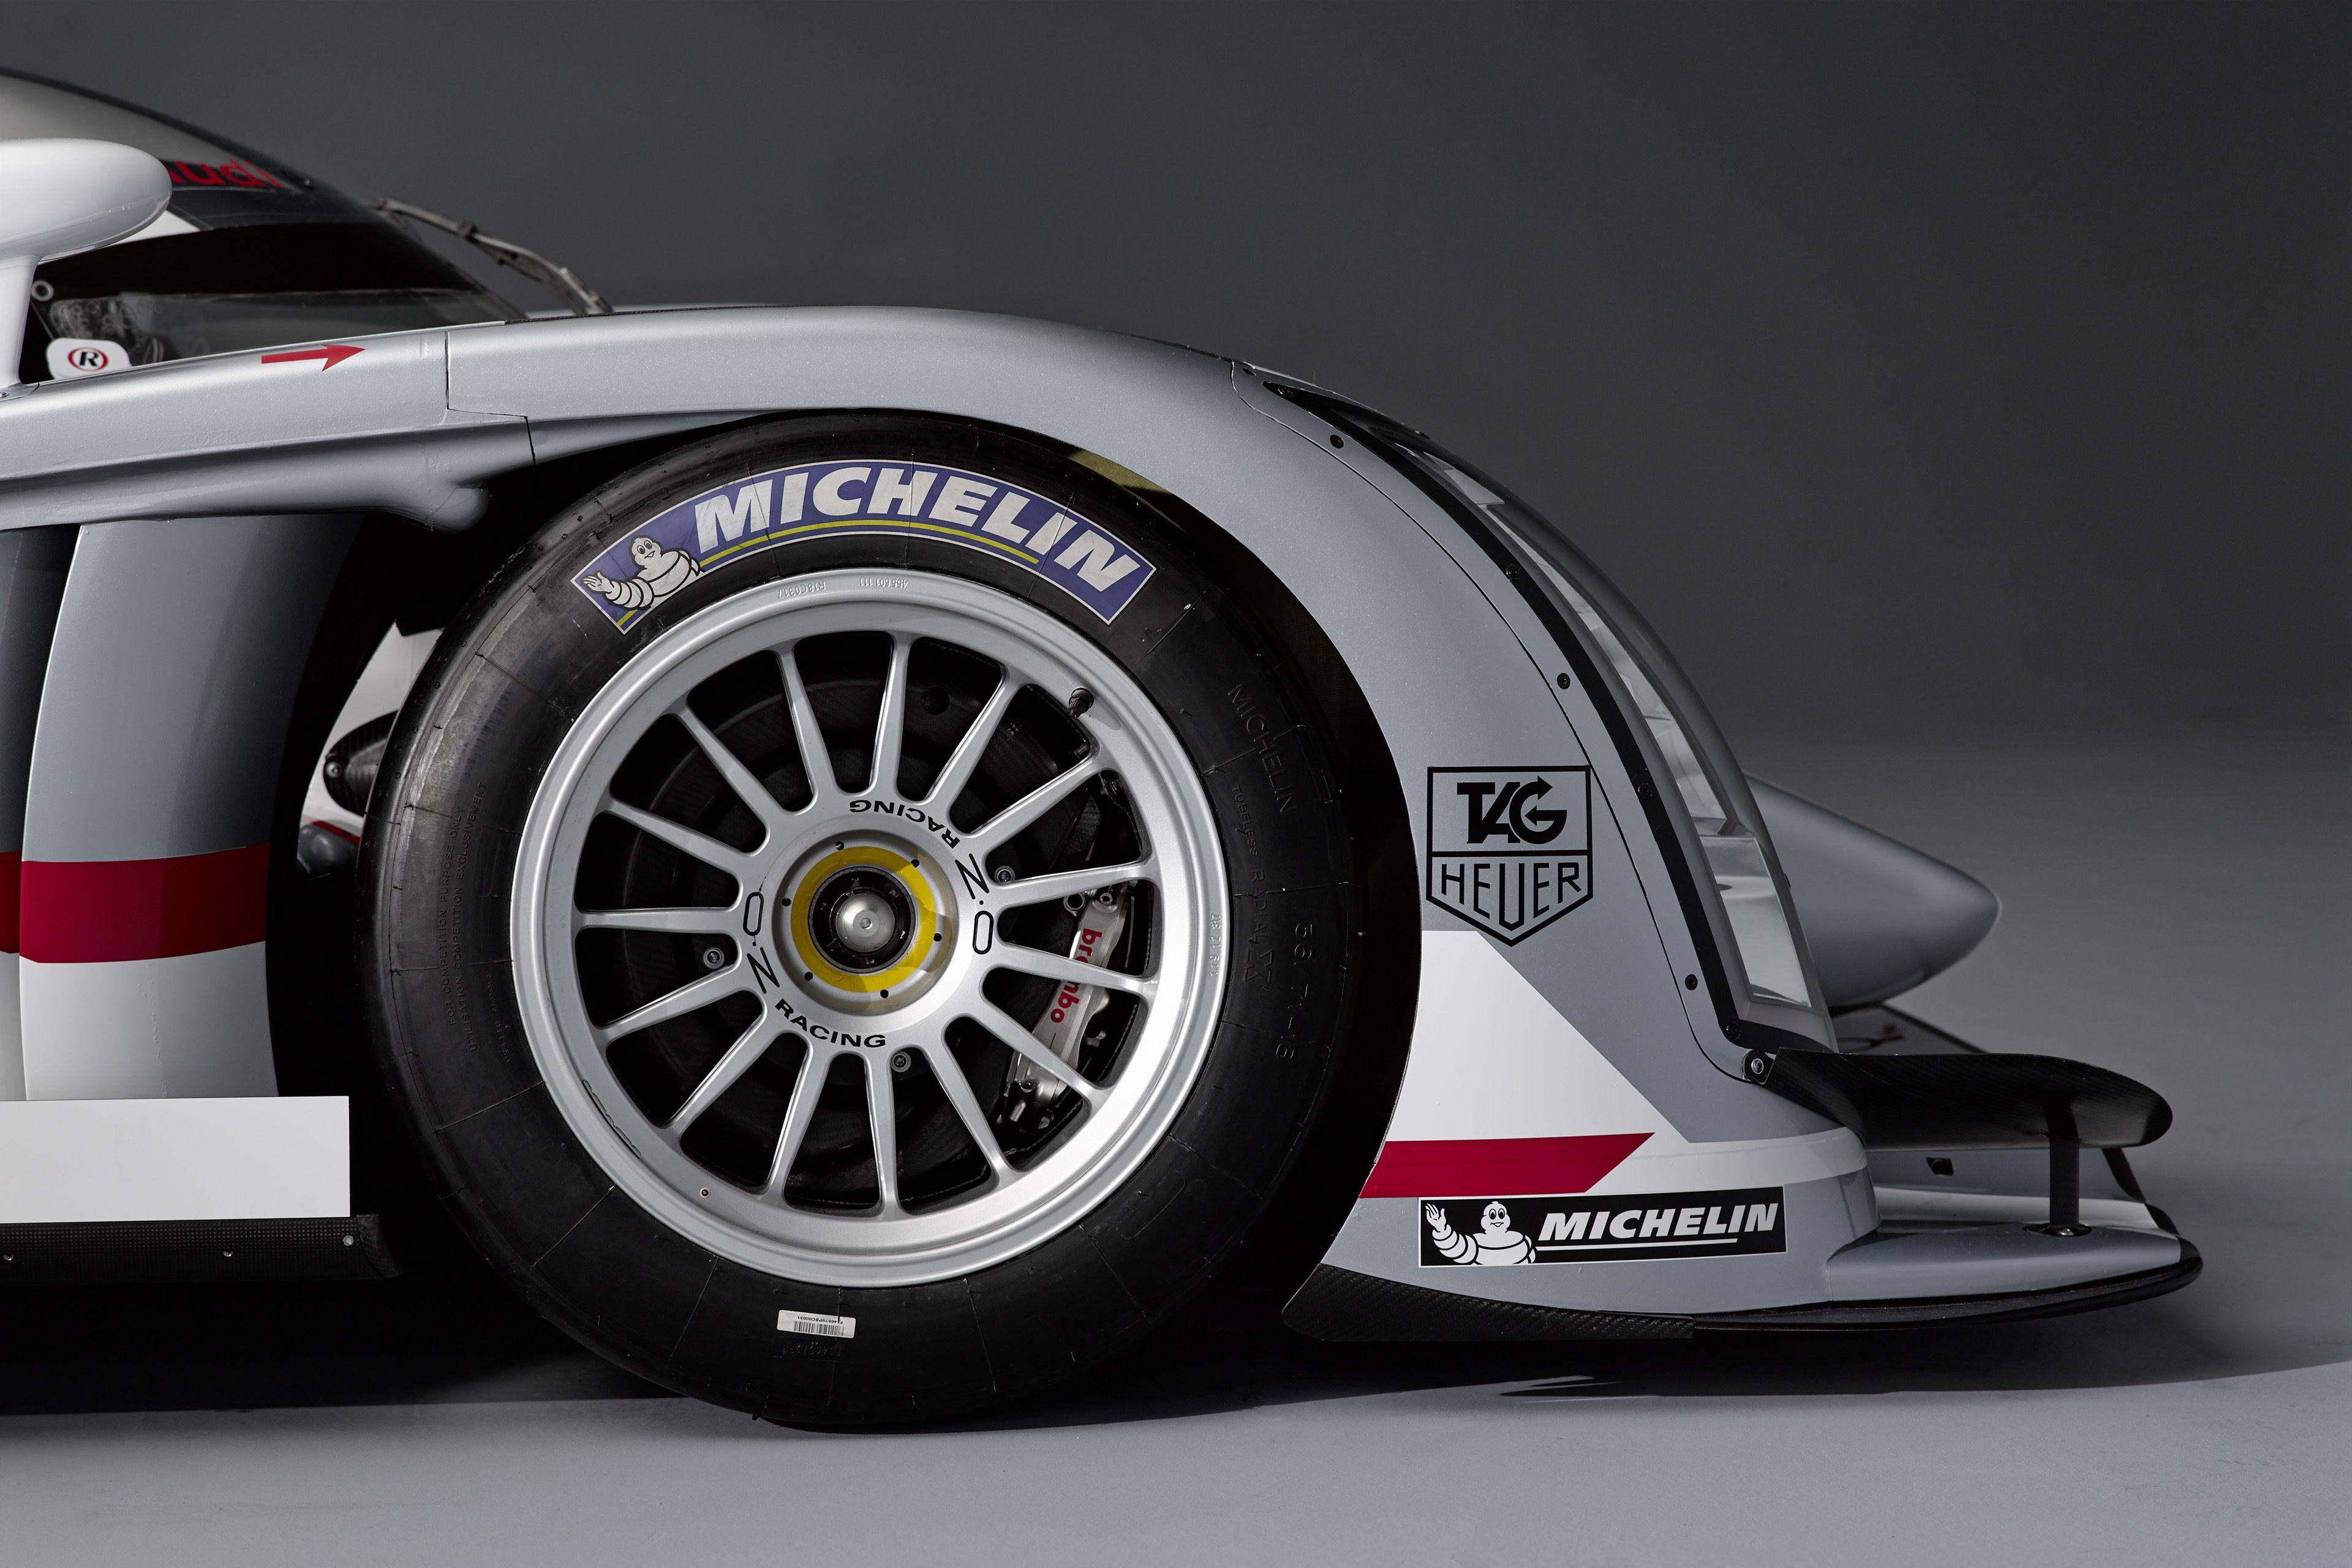 Audi R Etron Quattro Cars With OZ Racing Wheels OZRACING - Audi car tires